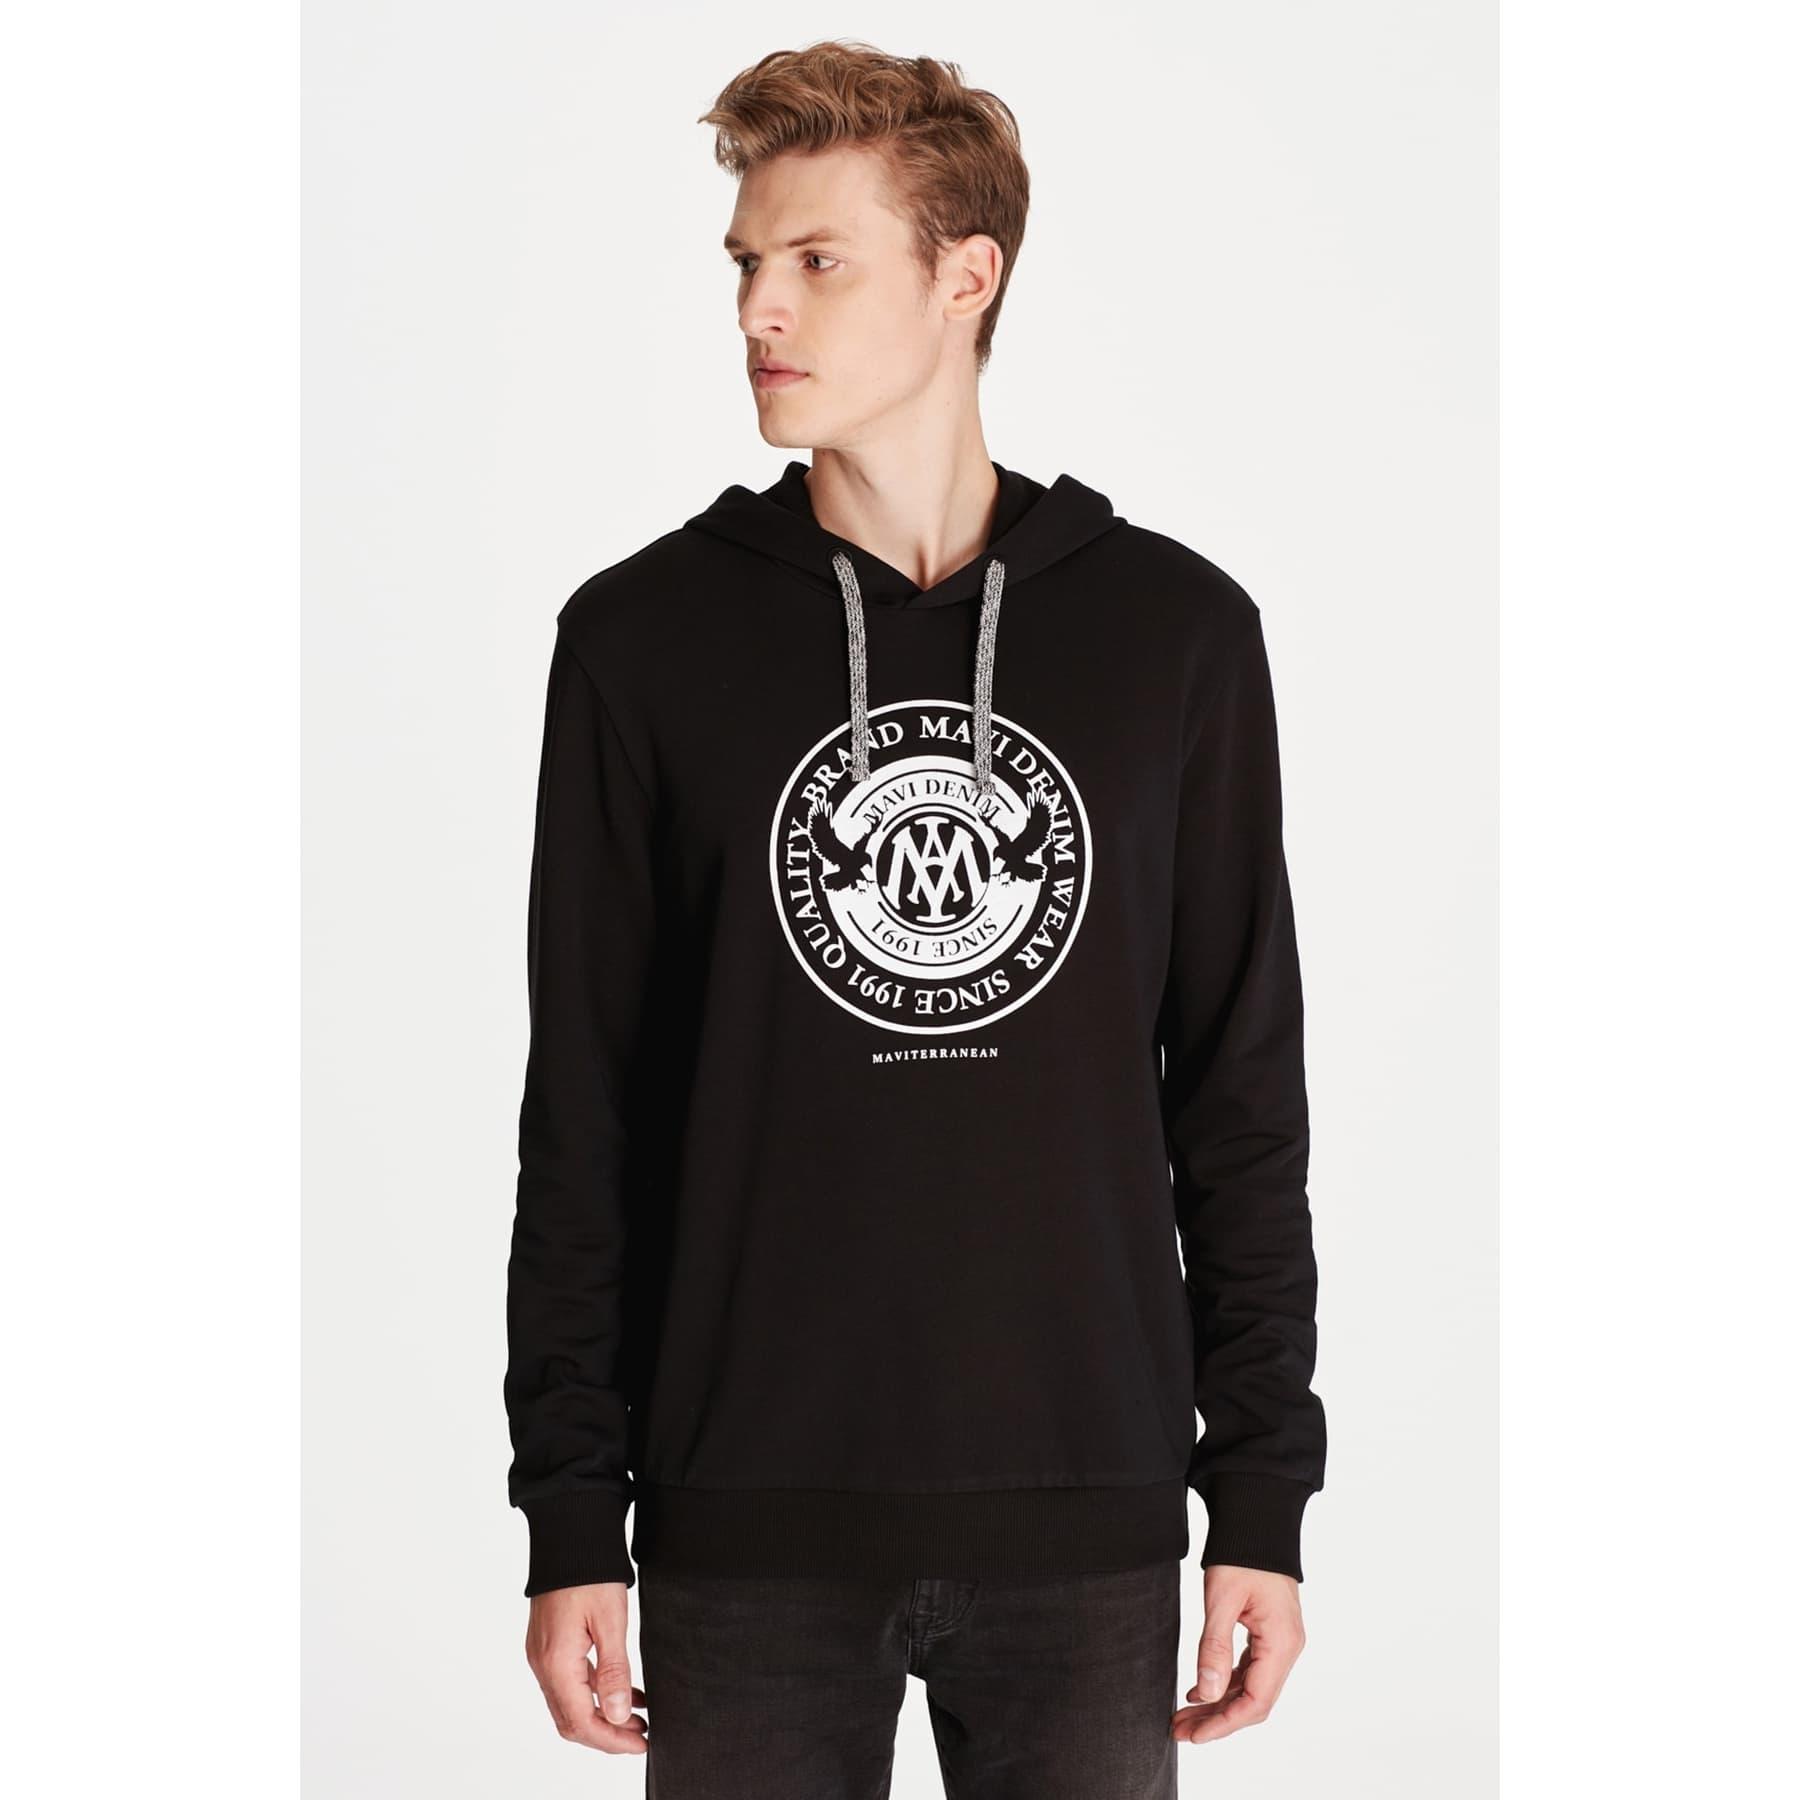 Mühür Logo Baskılı Kapüşonlu Siyah Sweatshirt